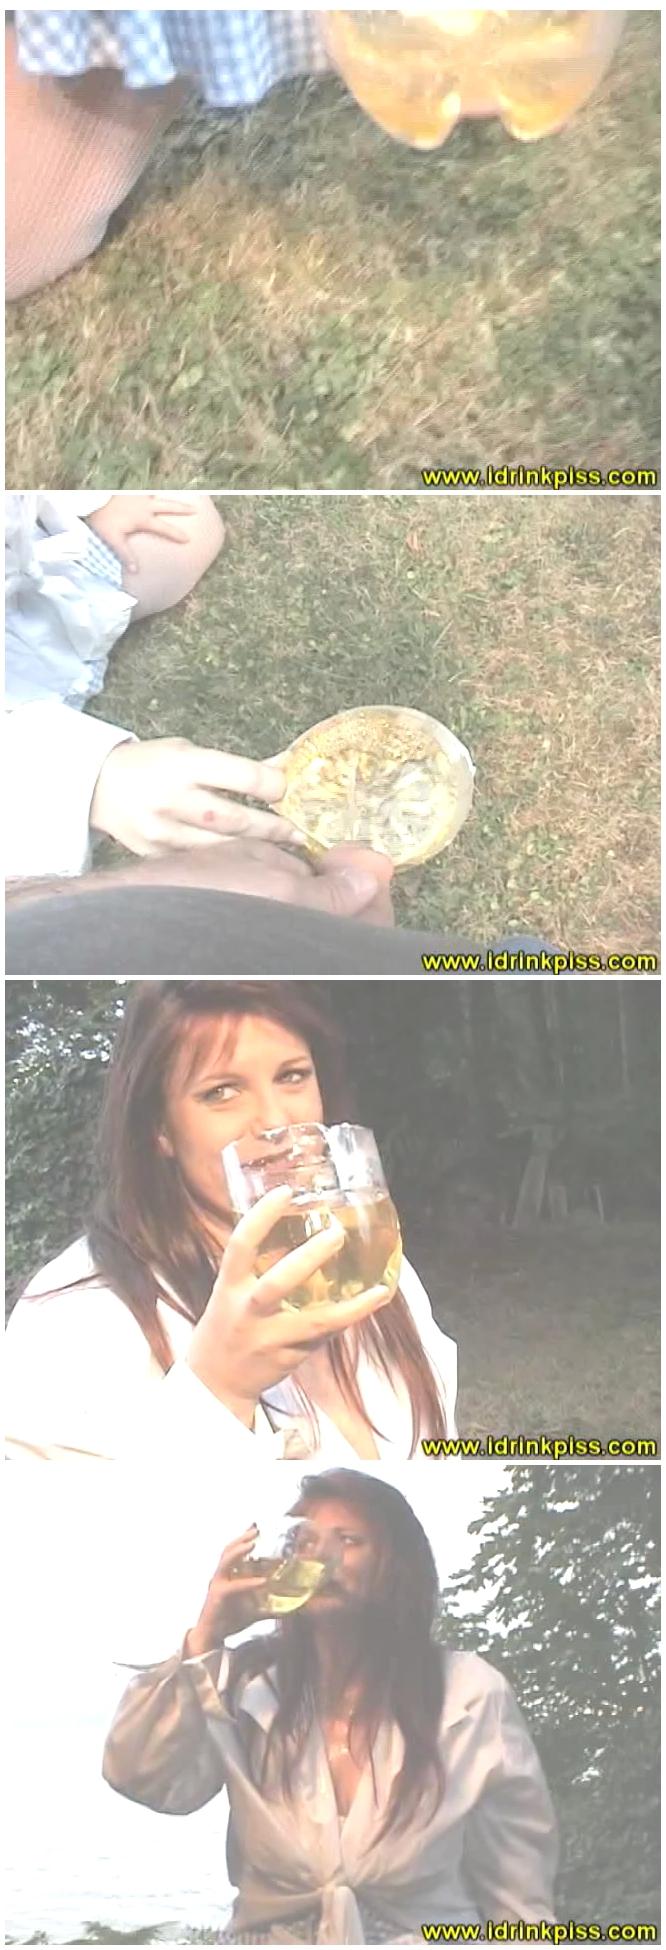 drinkingurine074_cover.jpg